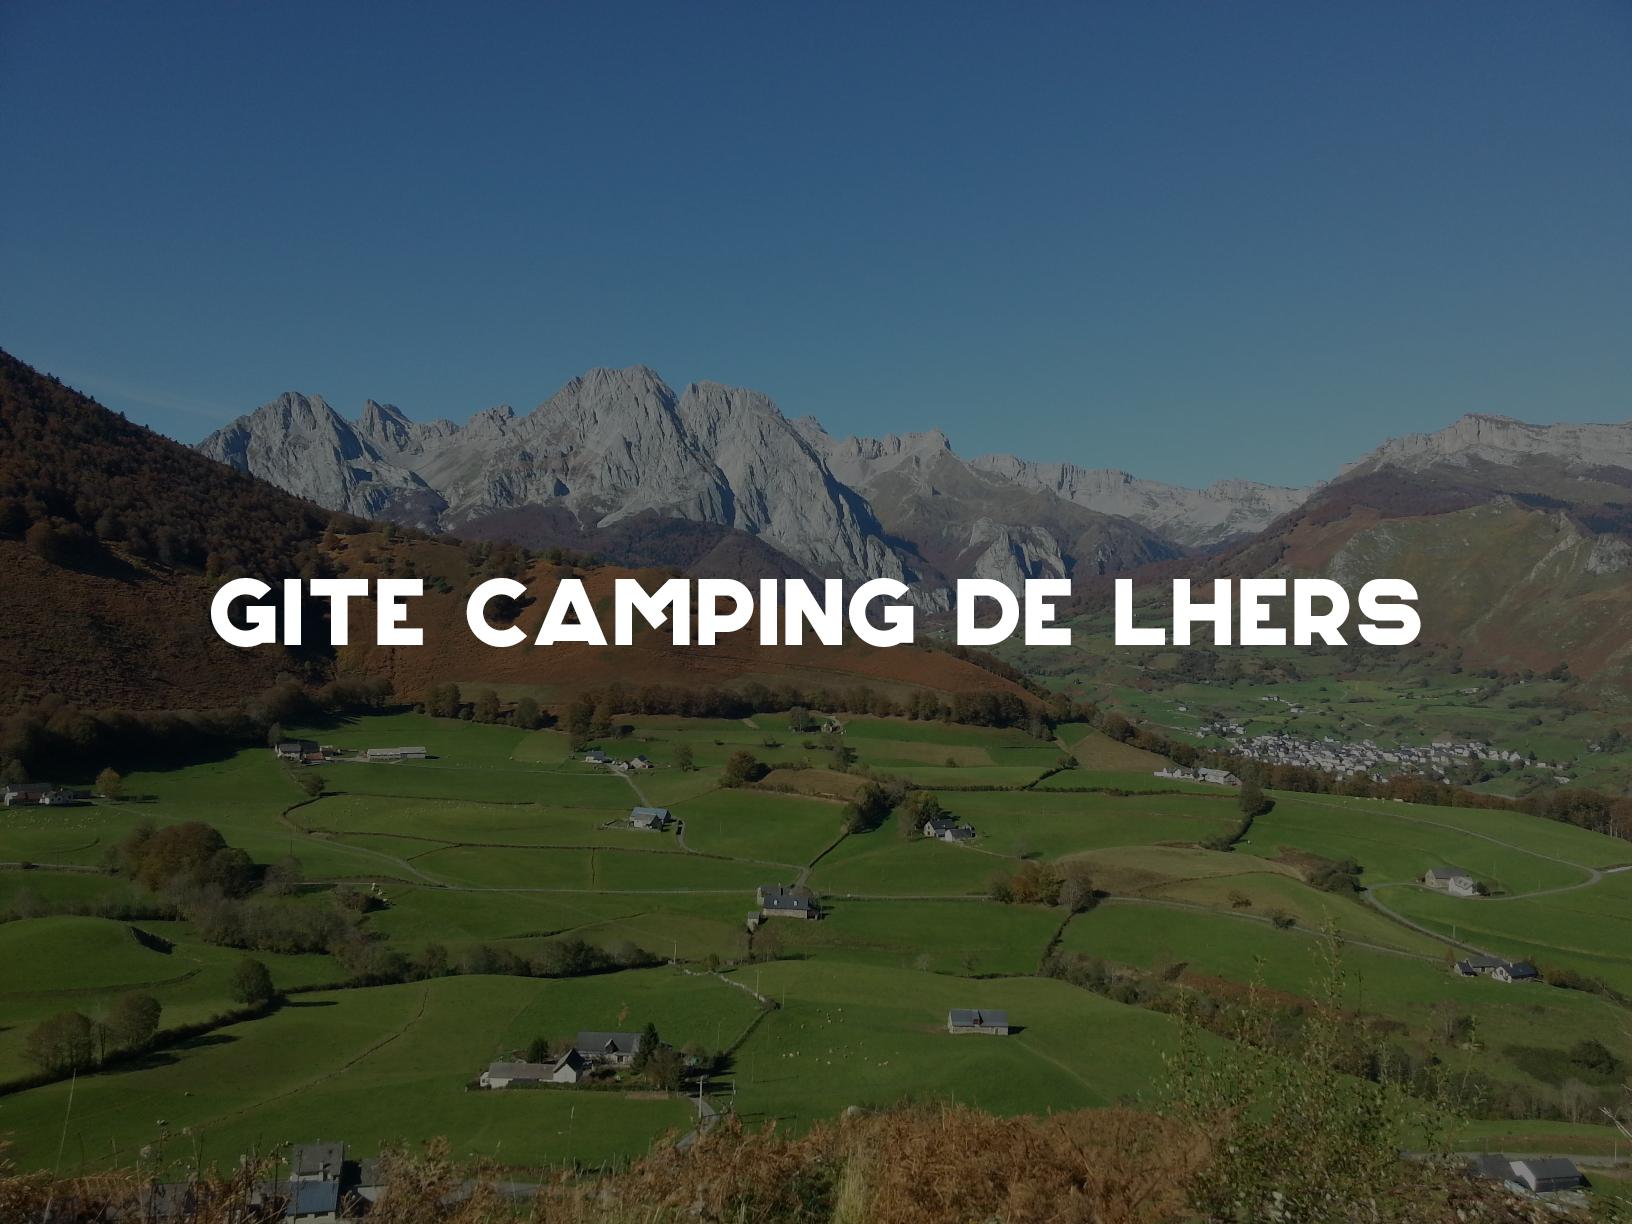 Gite Camping de Lhers